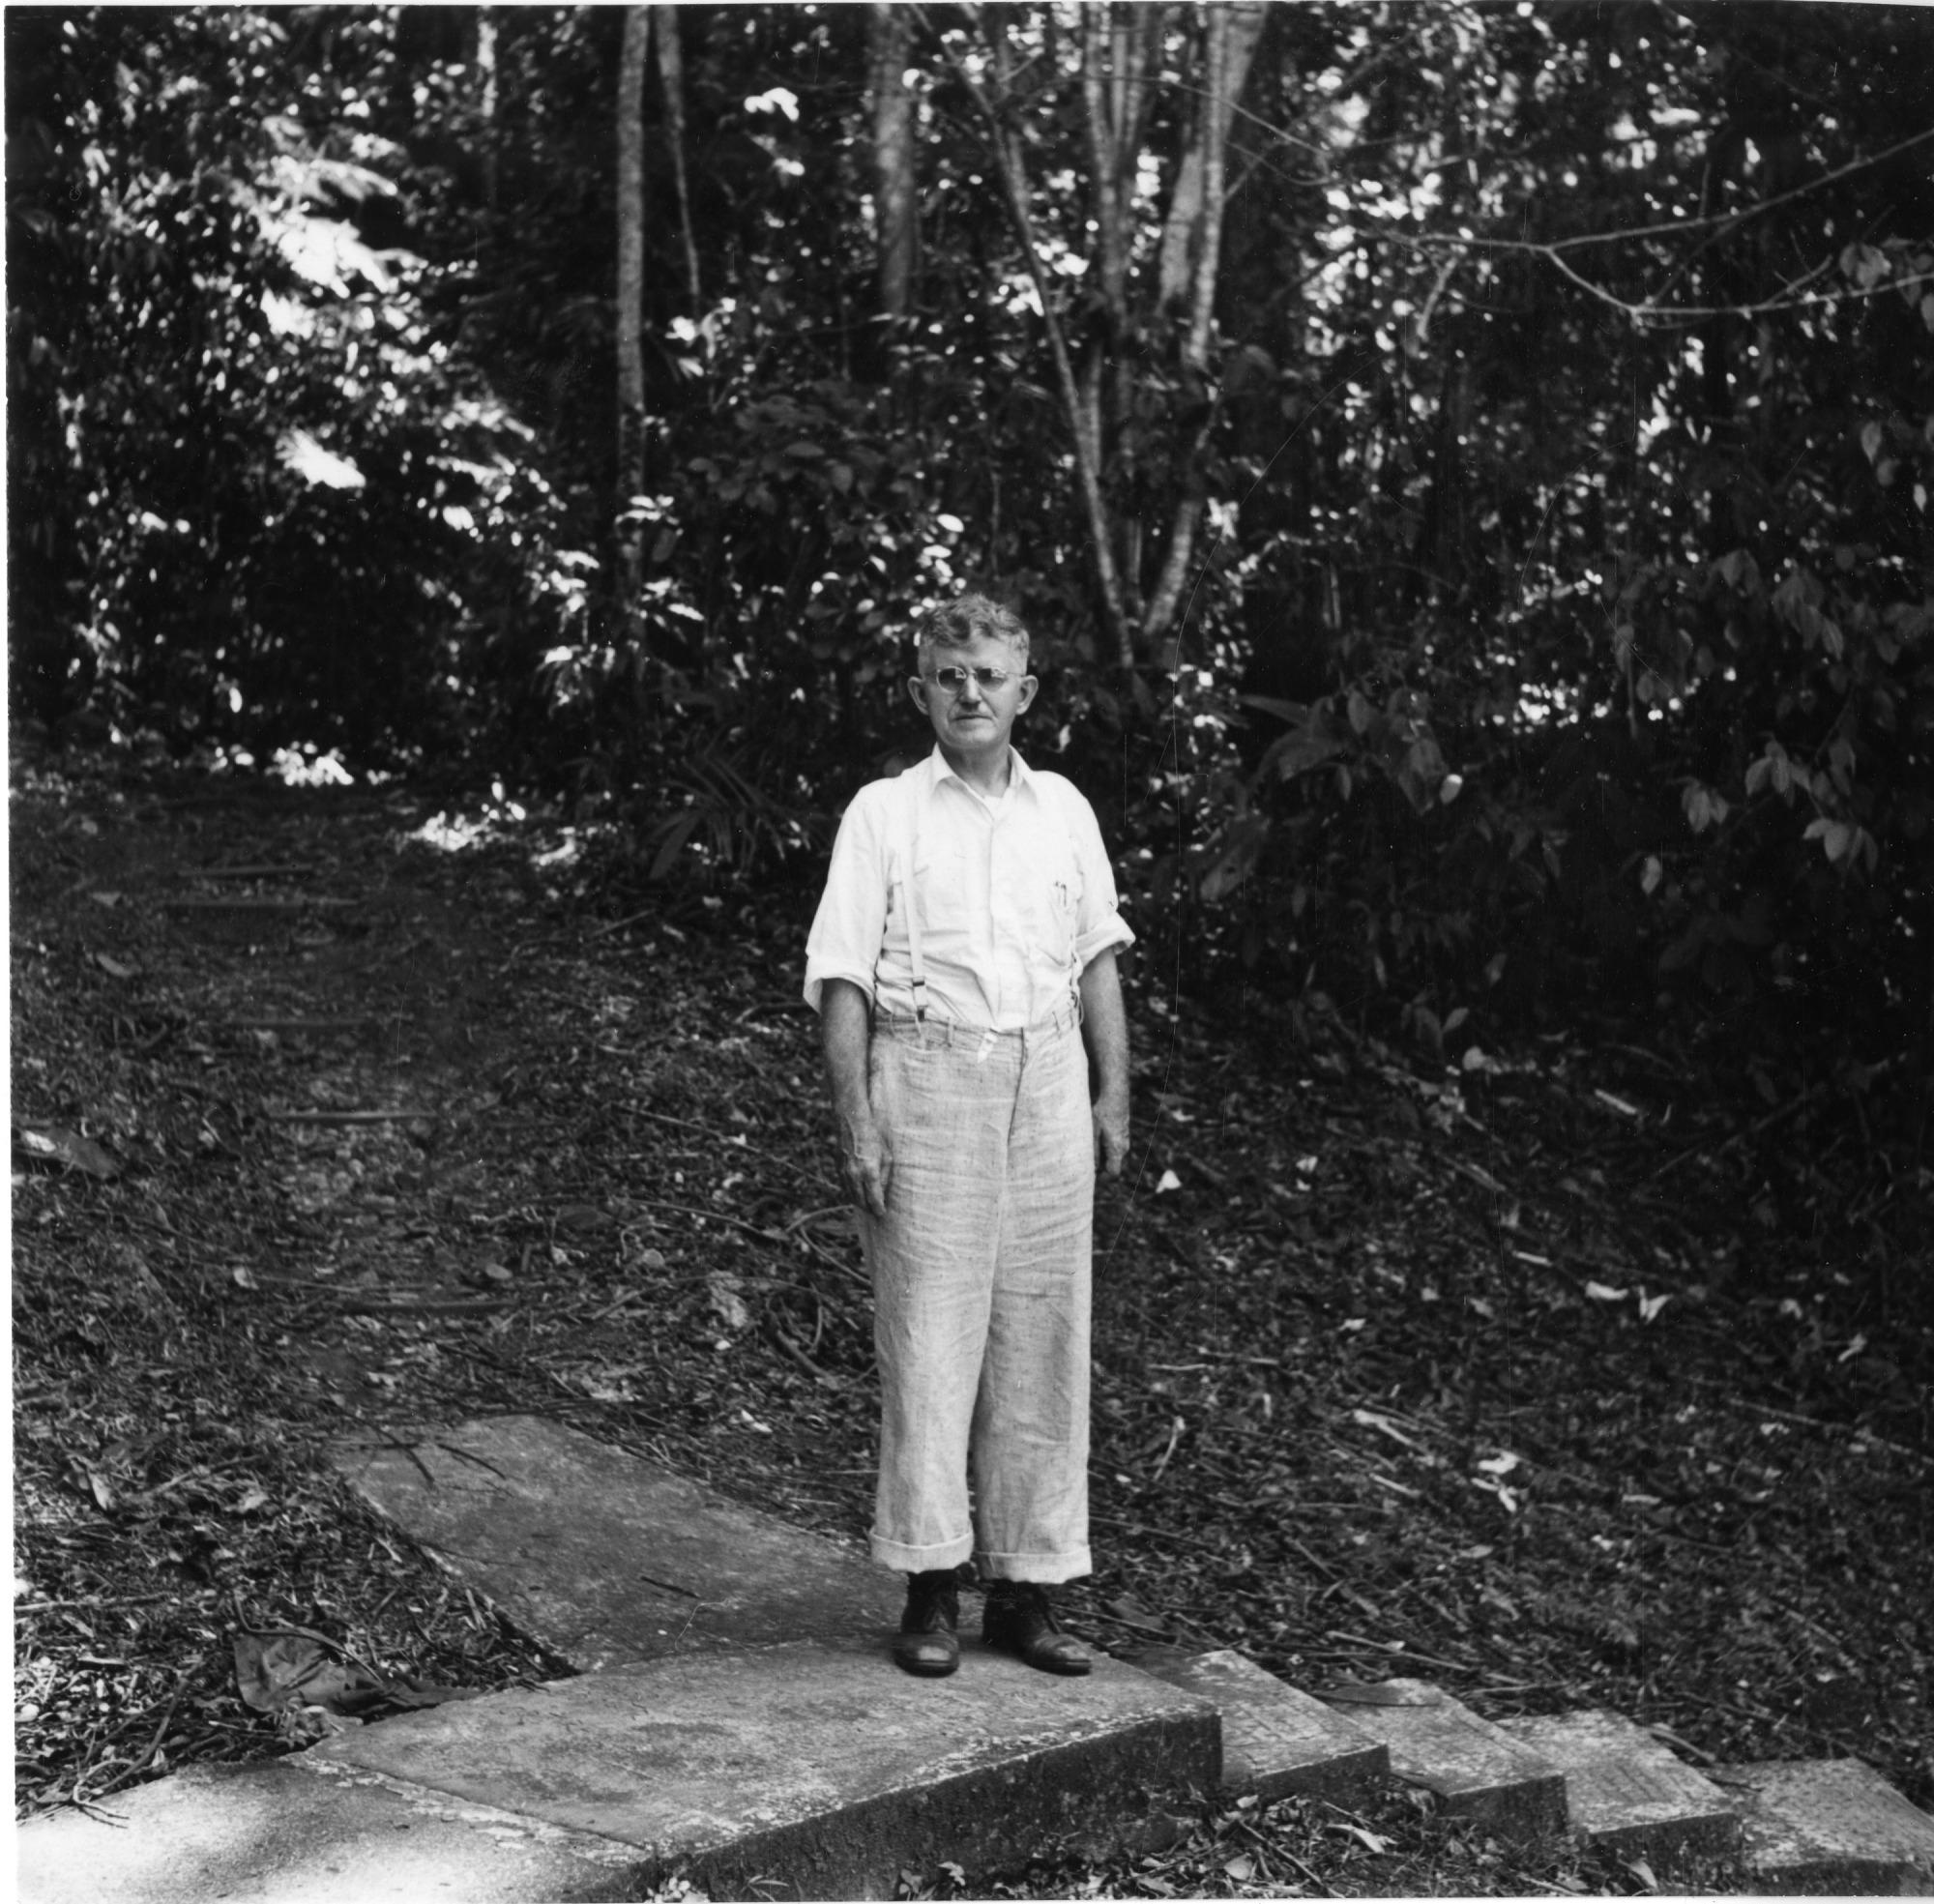 James Zetek on Barro Colorado Island